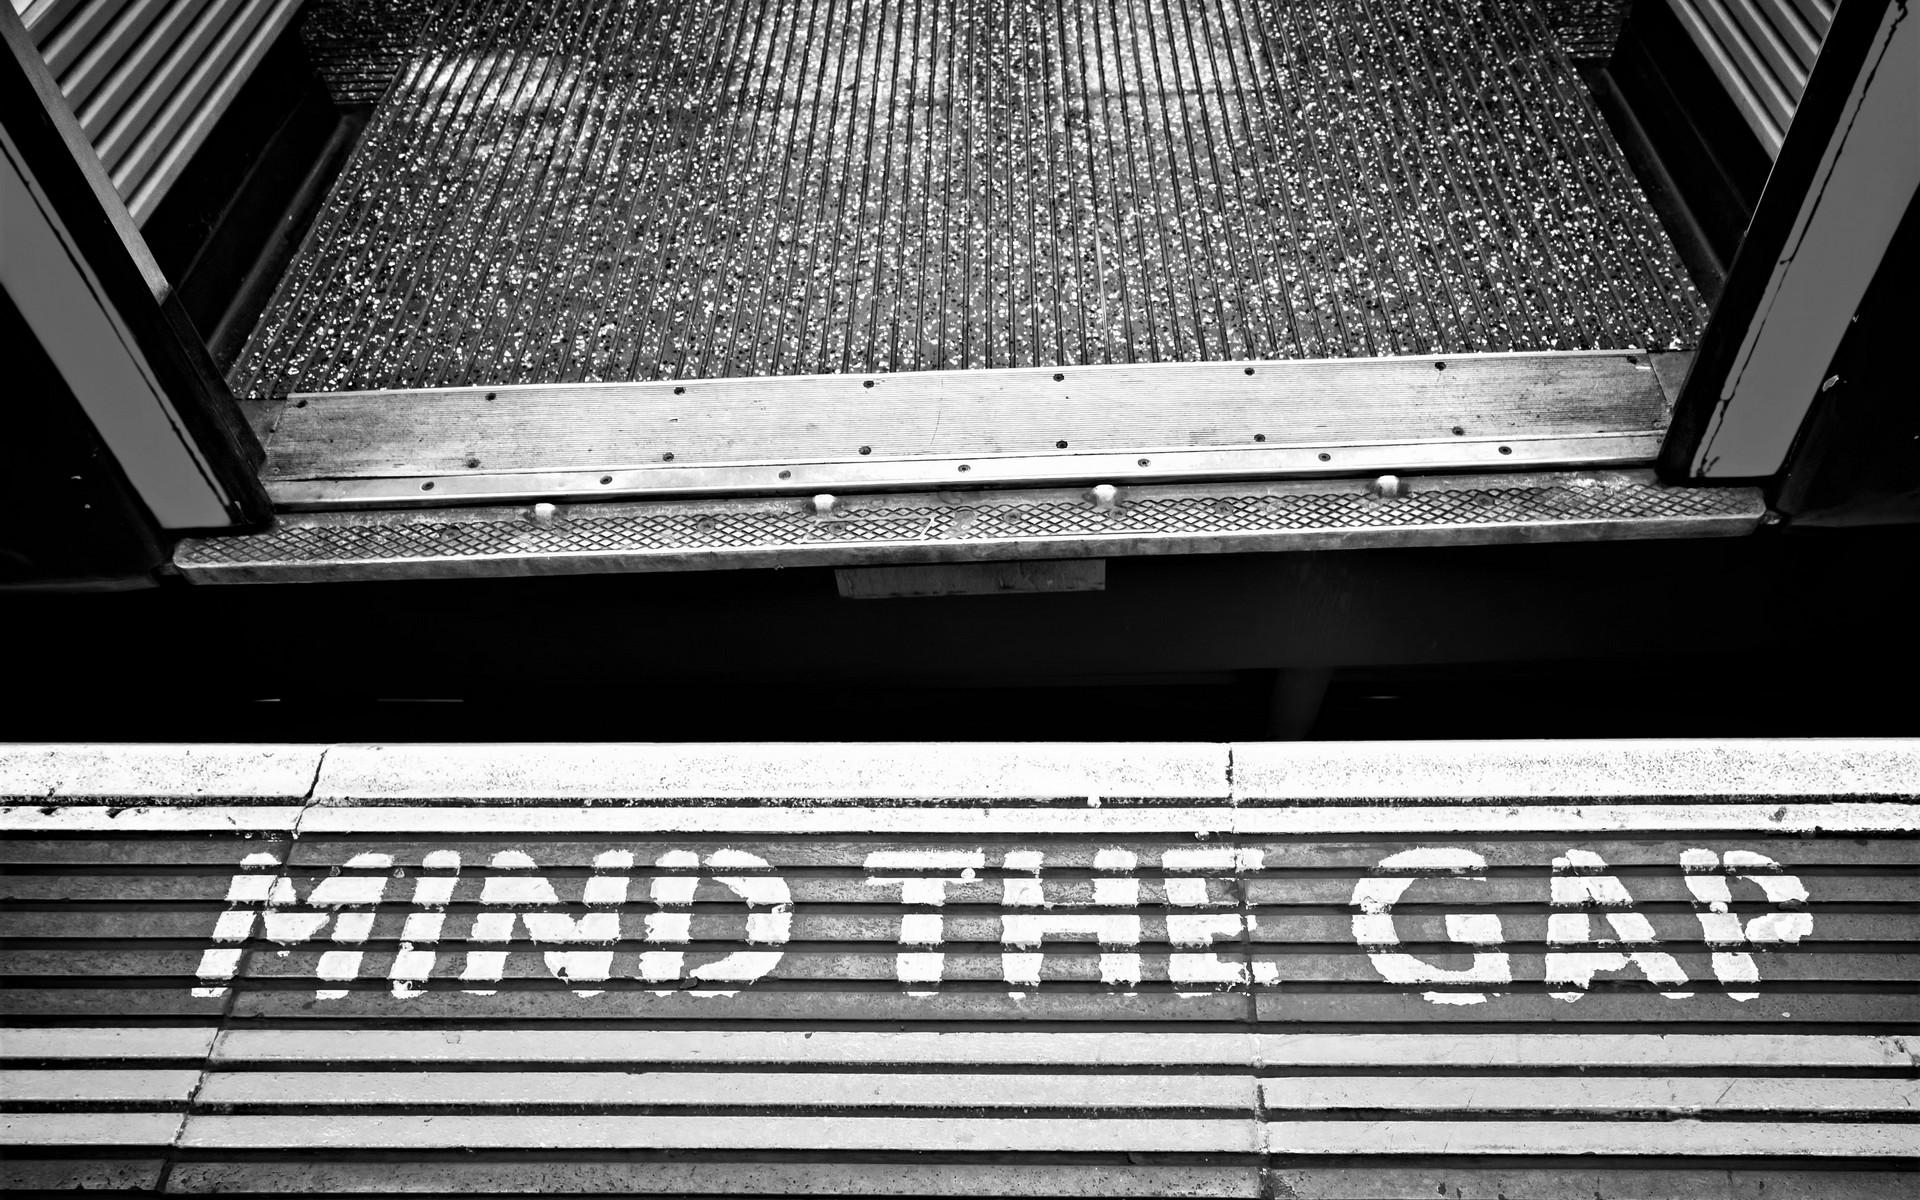 Crossrail delay, mind the gap